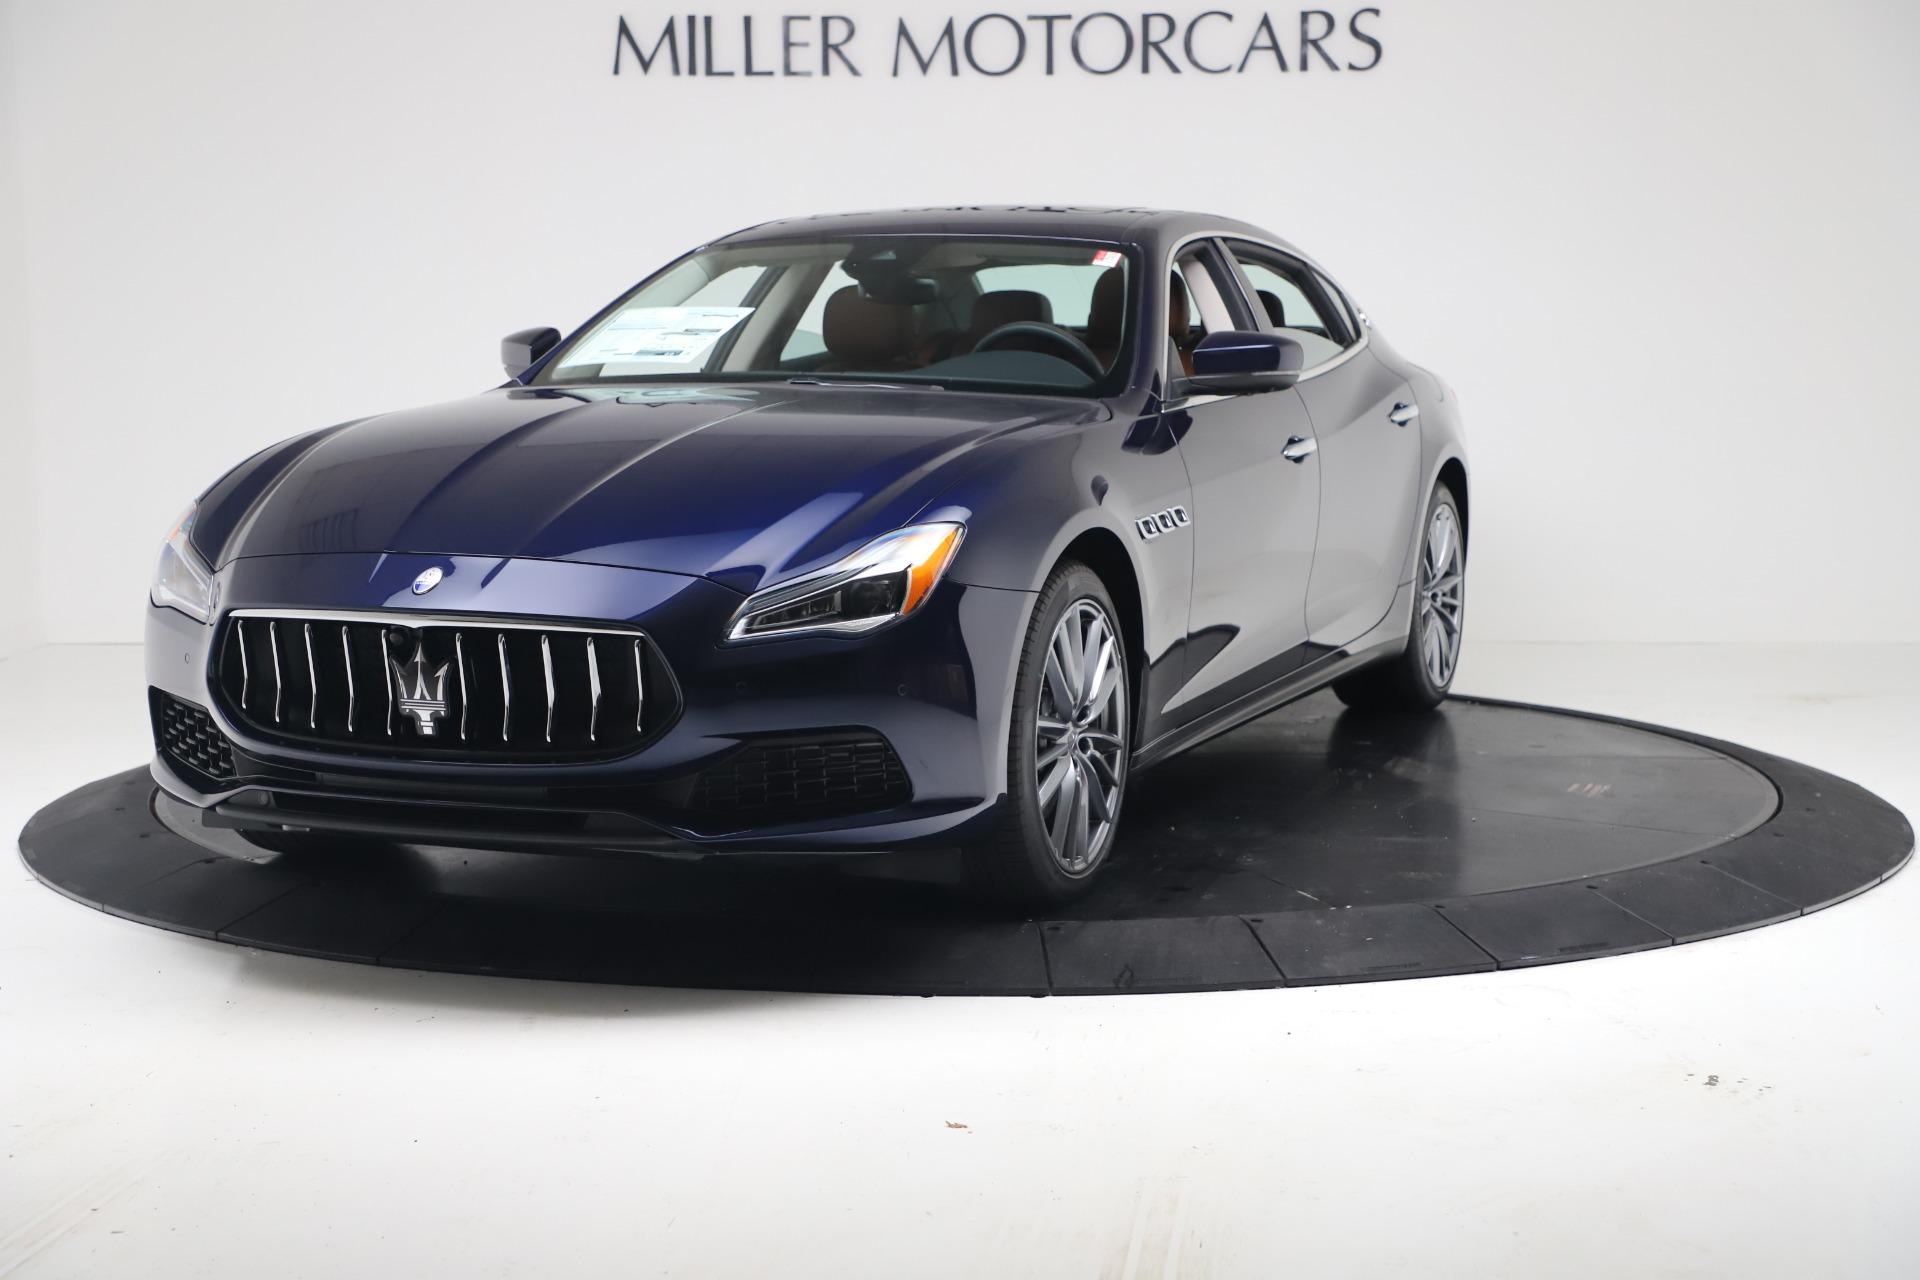 New 2019 Maserati Quattroporte S Q4 For Sale In Westport, CT 3440_main